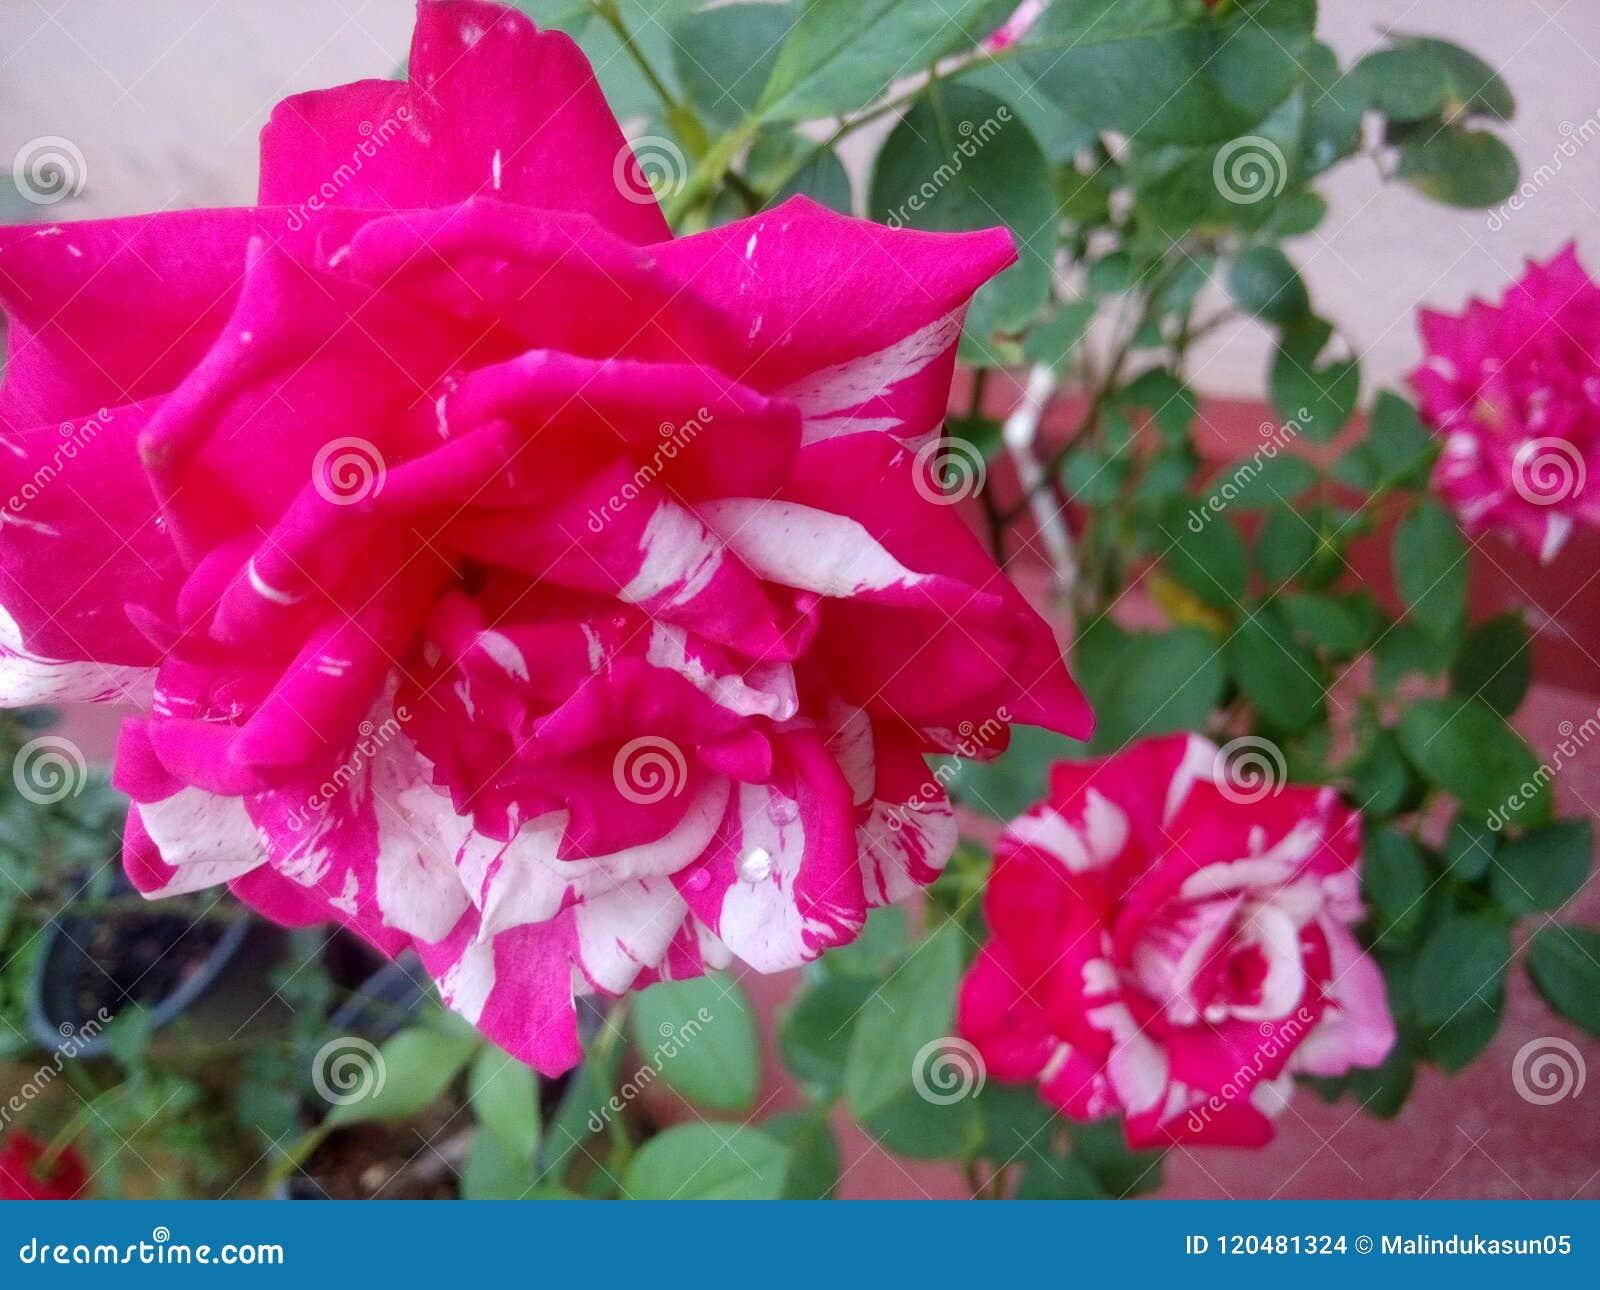 White red rose flower in the garden stock photo image of lotus white red rose flower in the garden mightylinksfo